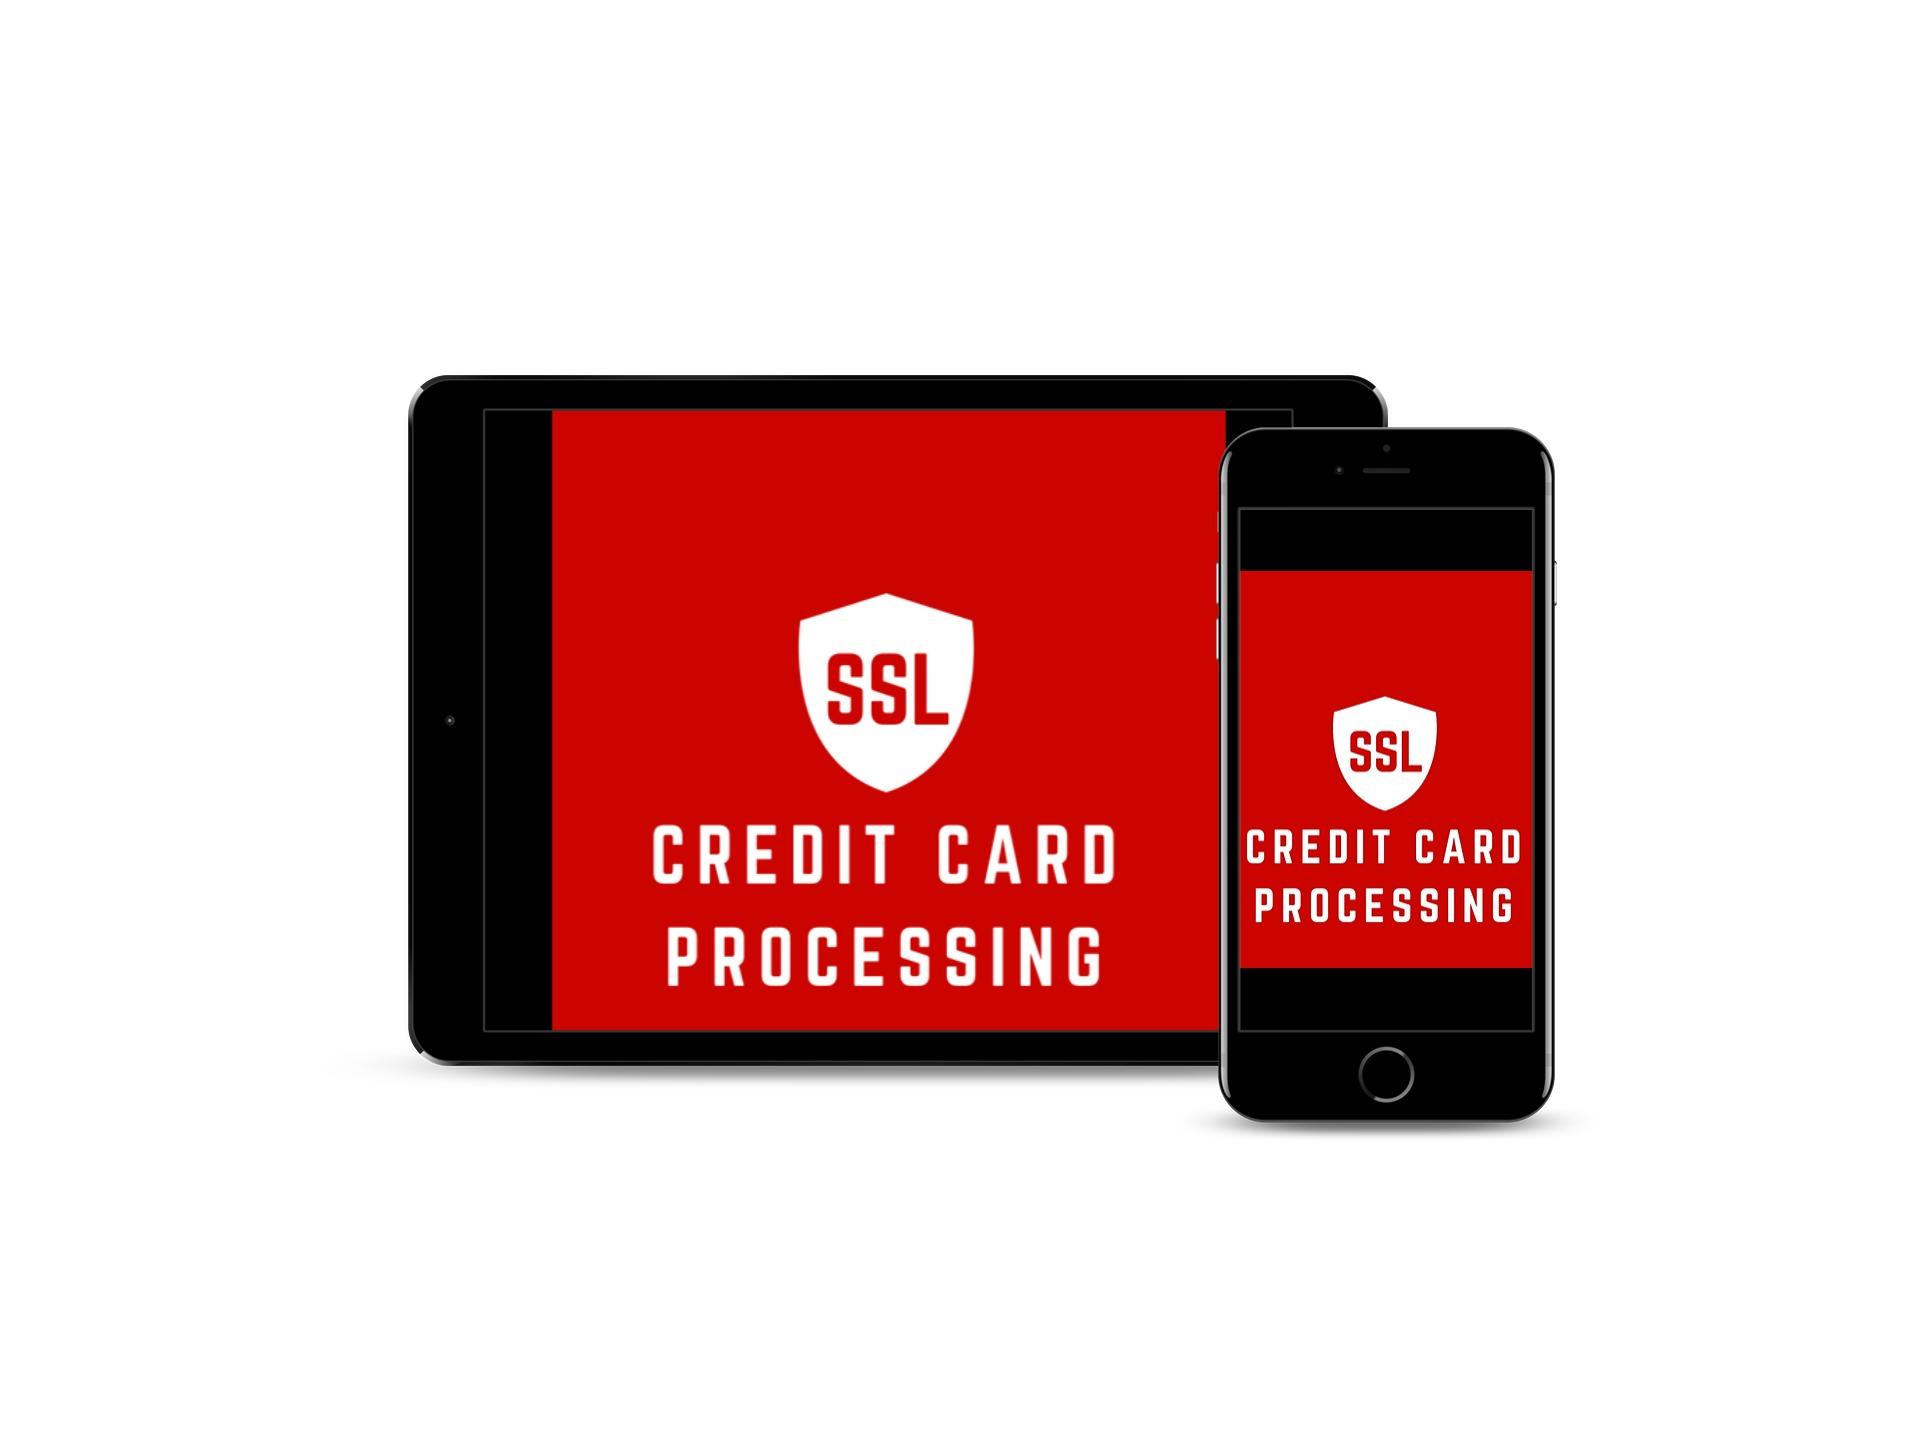 SSL Credit Card Processing With Quadrapay